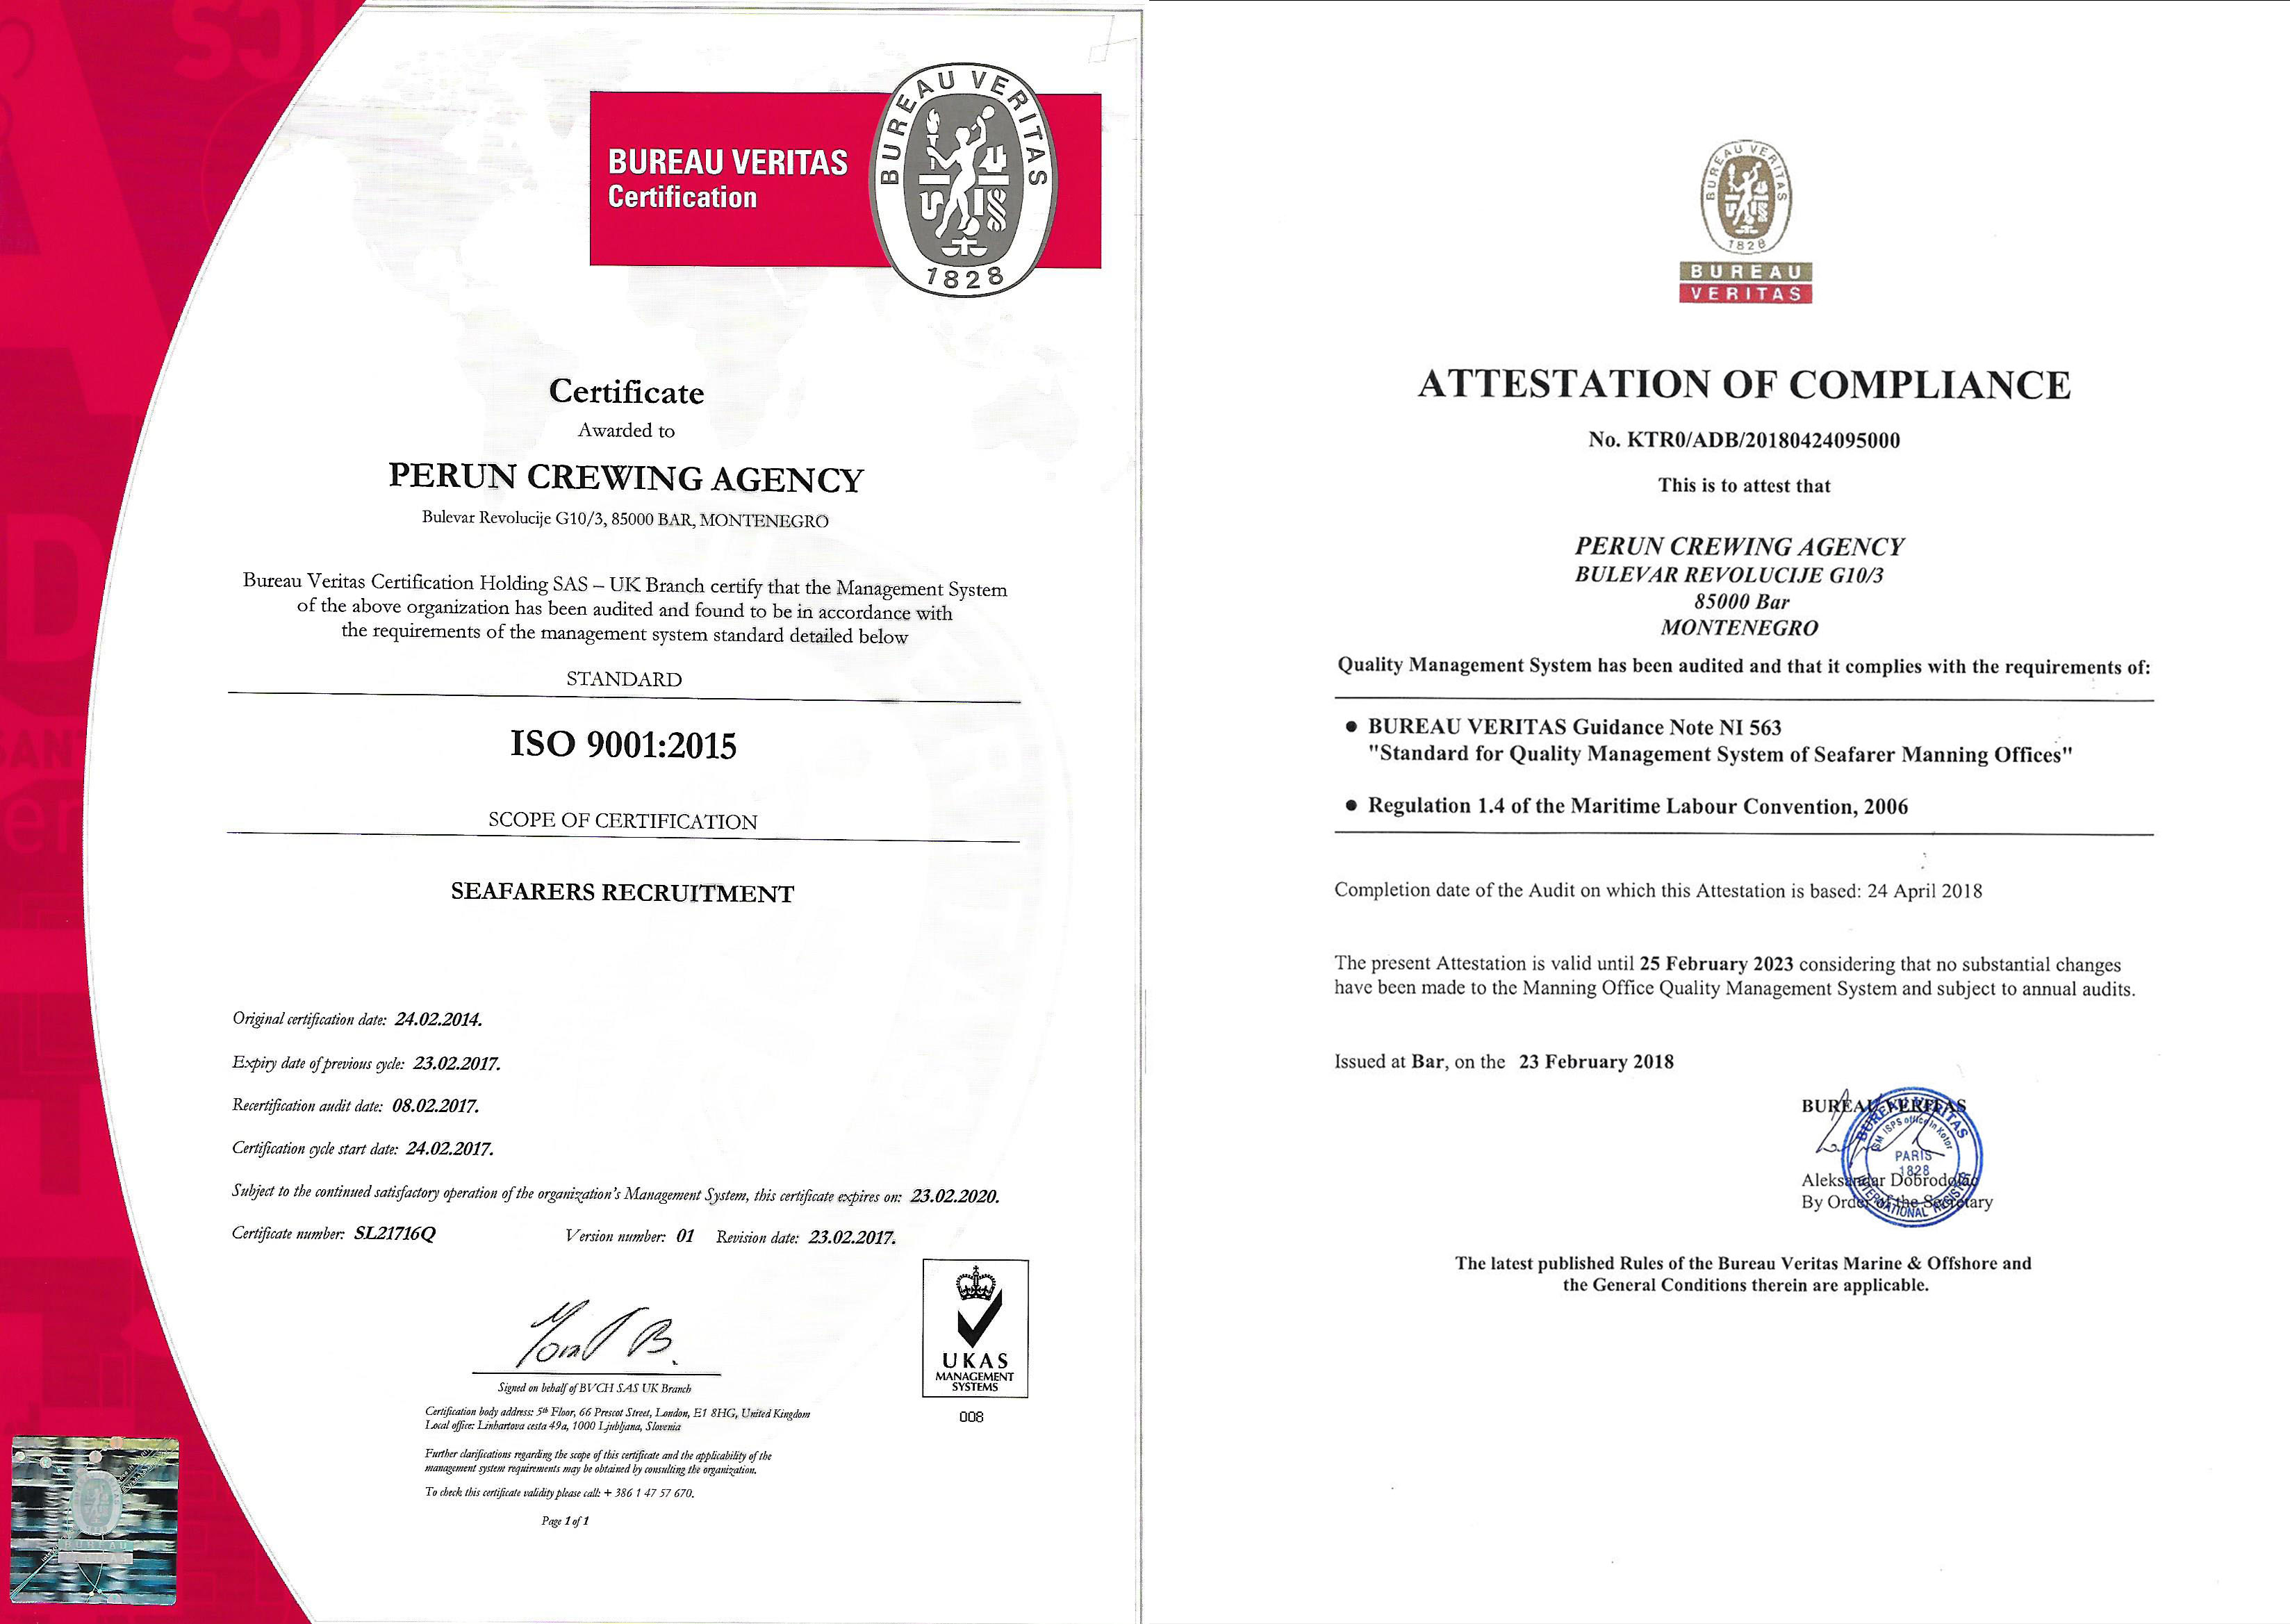 Certificates - Perun crewing agency